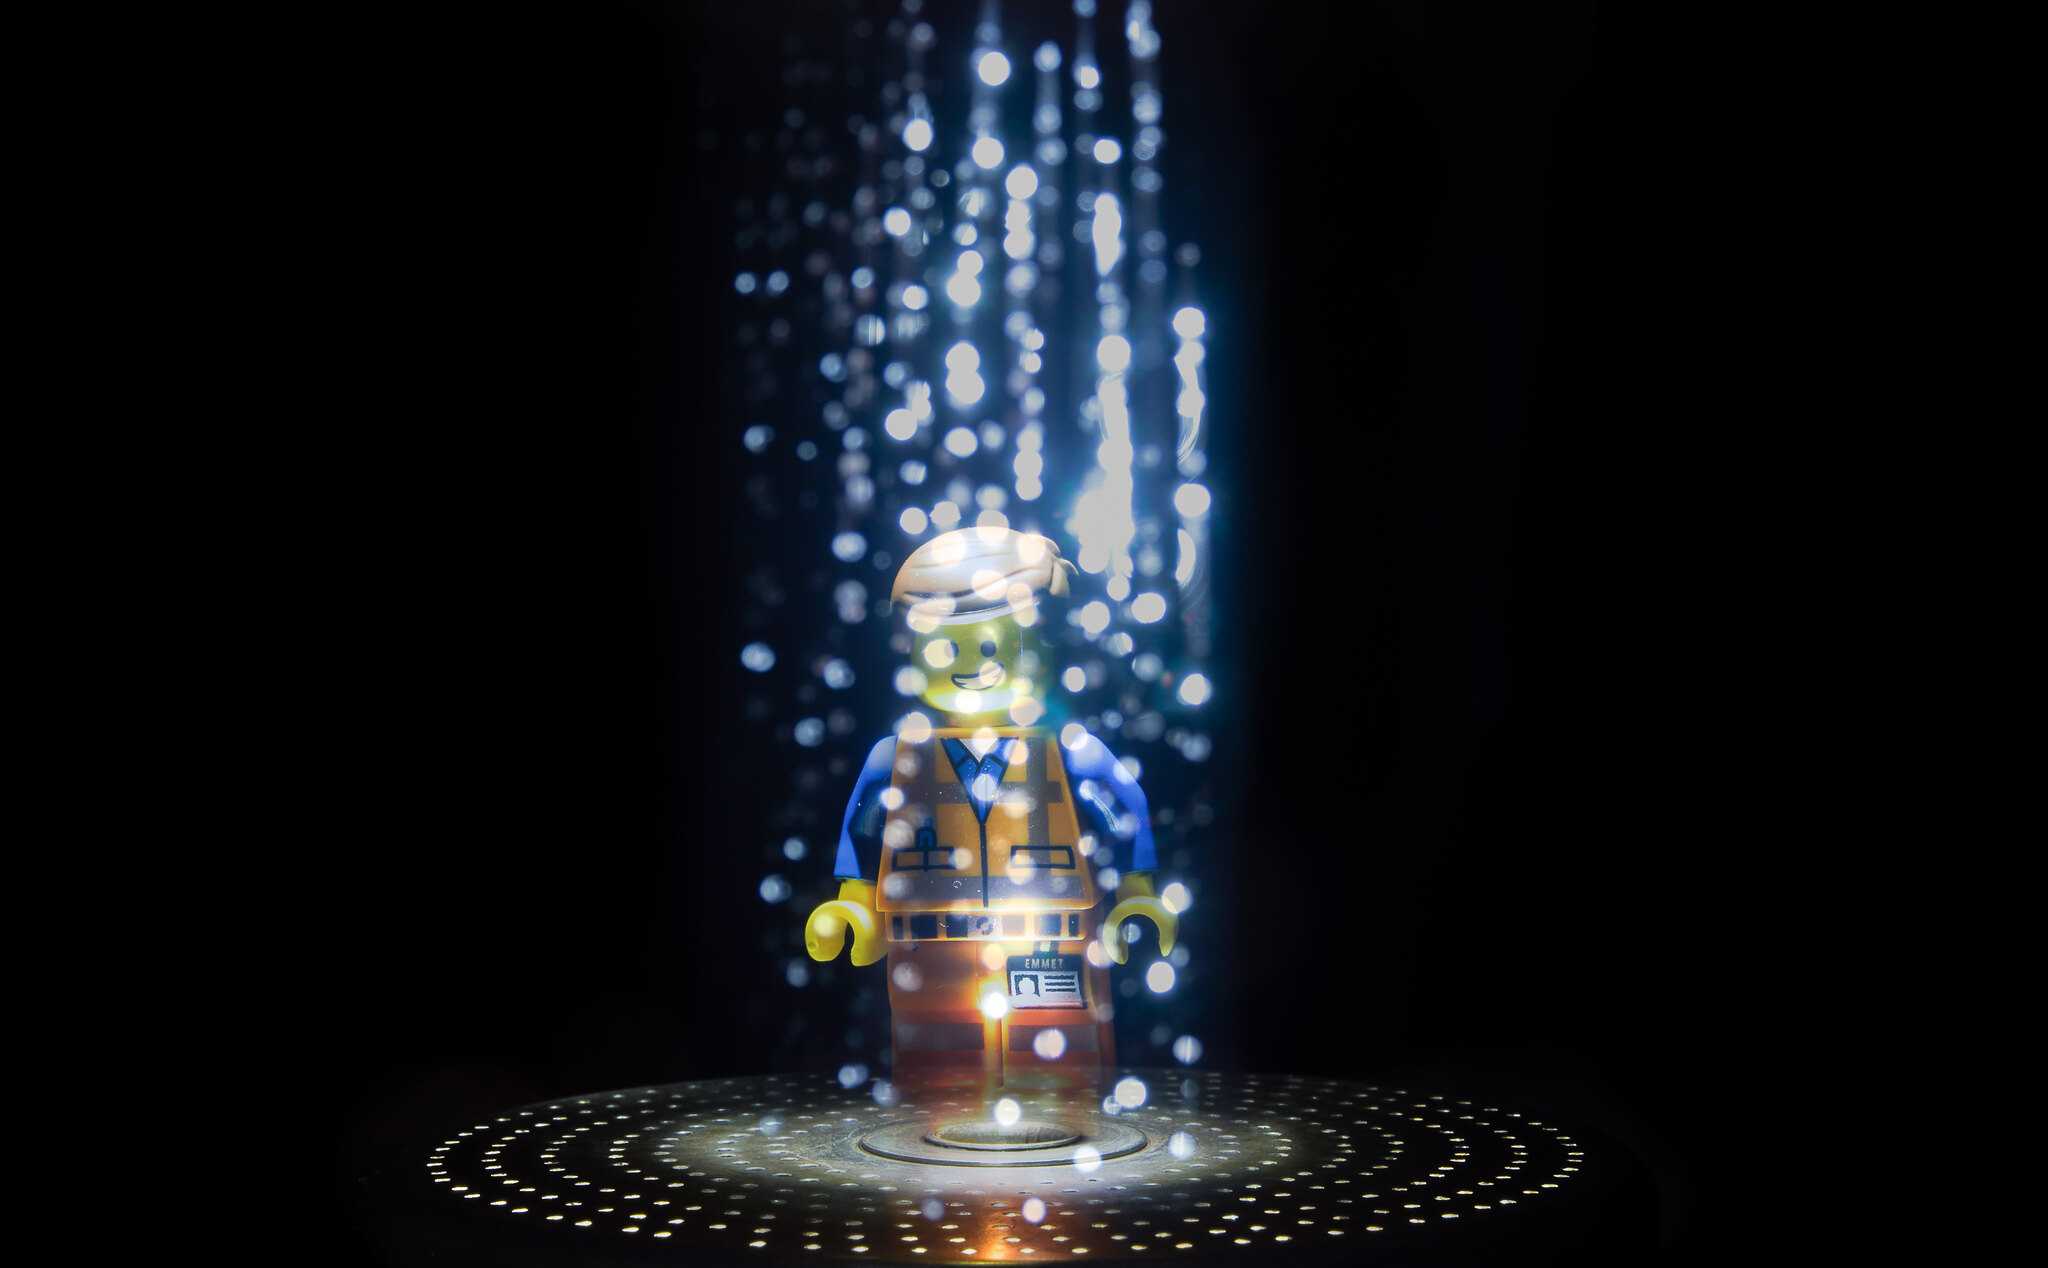 Quantum teleportation near zero latency